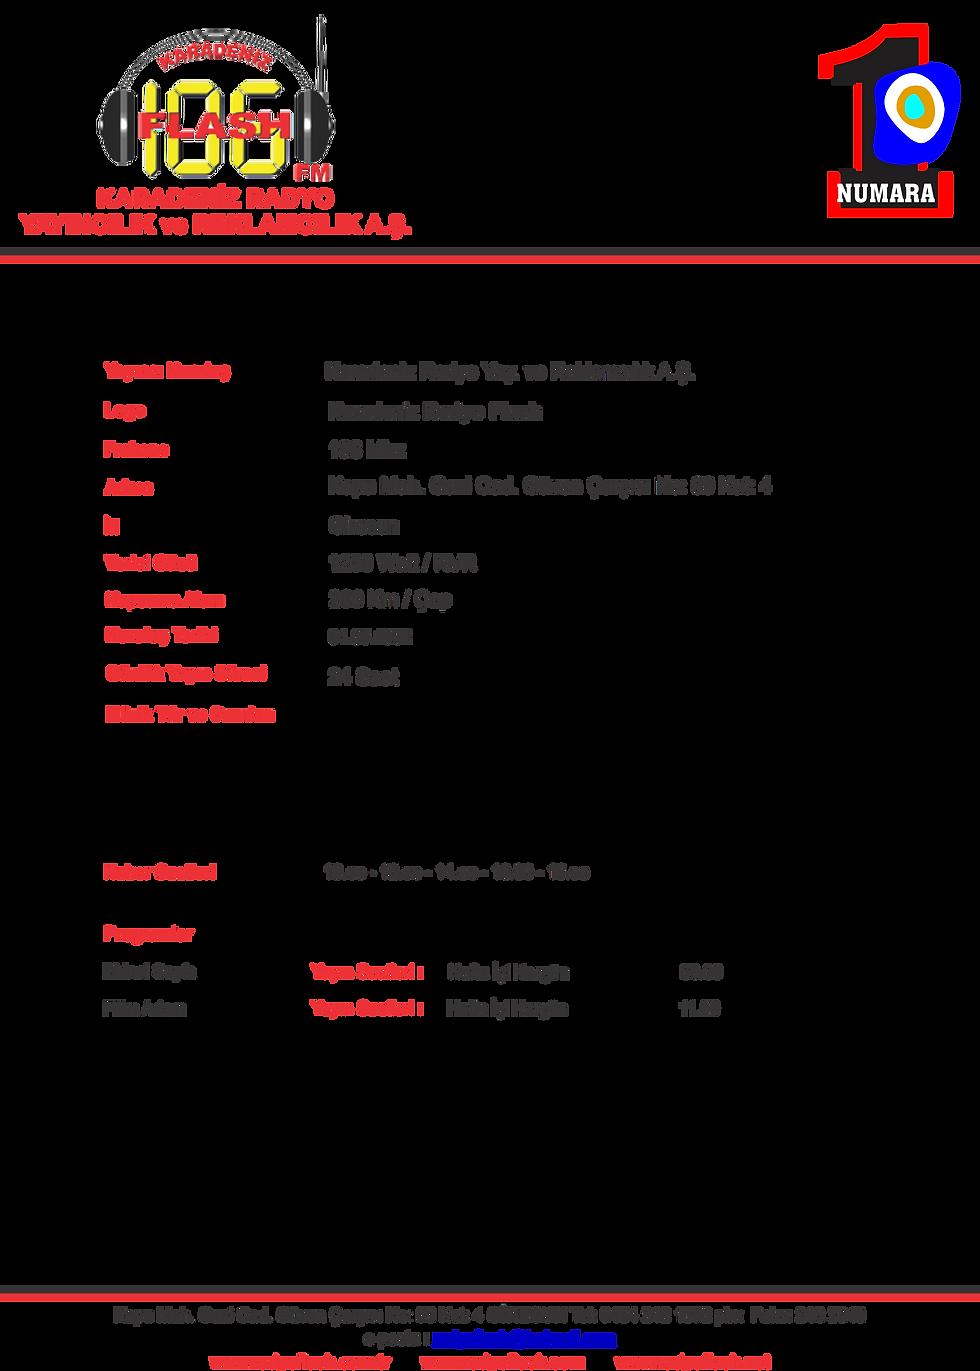 Radyo Bilgi Form 24.04.2021.png